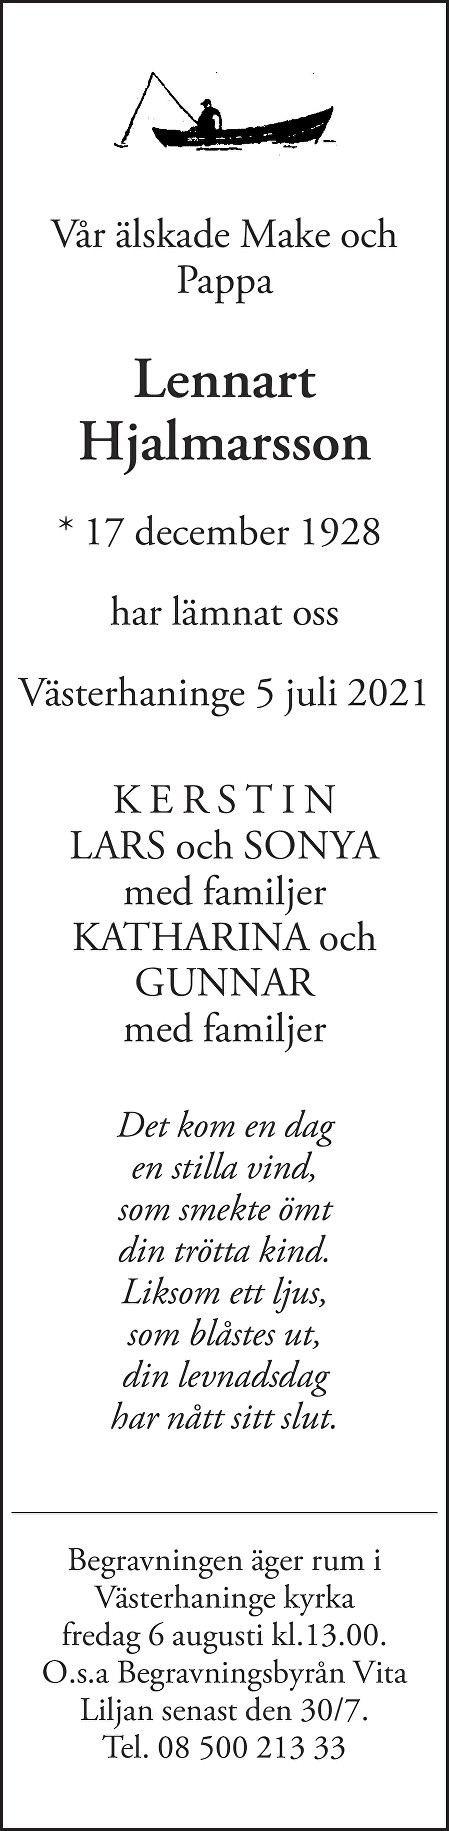 Lennart Hjalmarsson Death notice